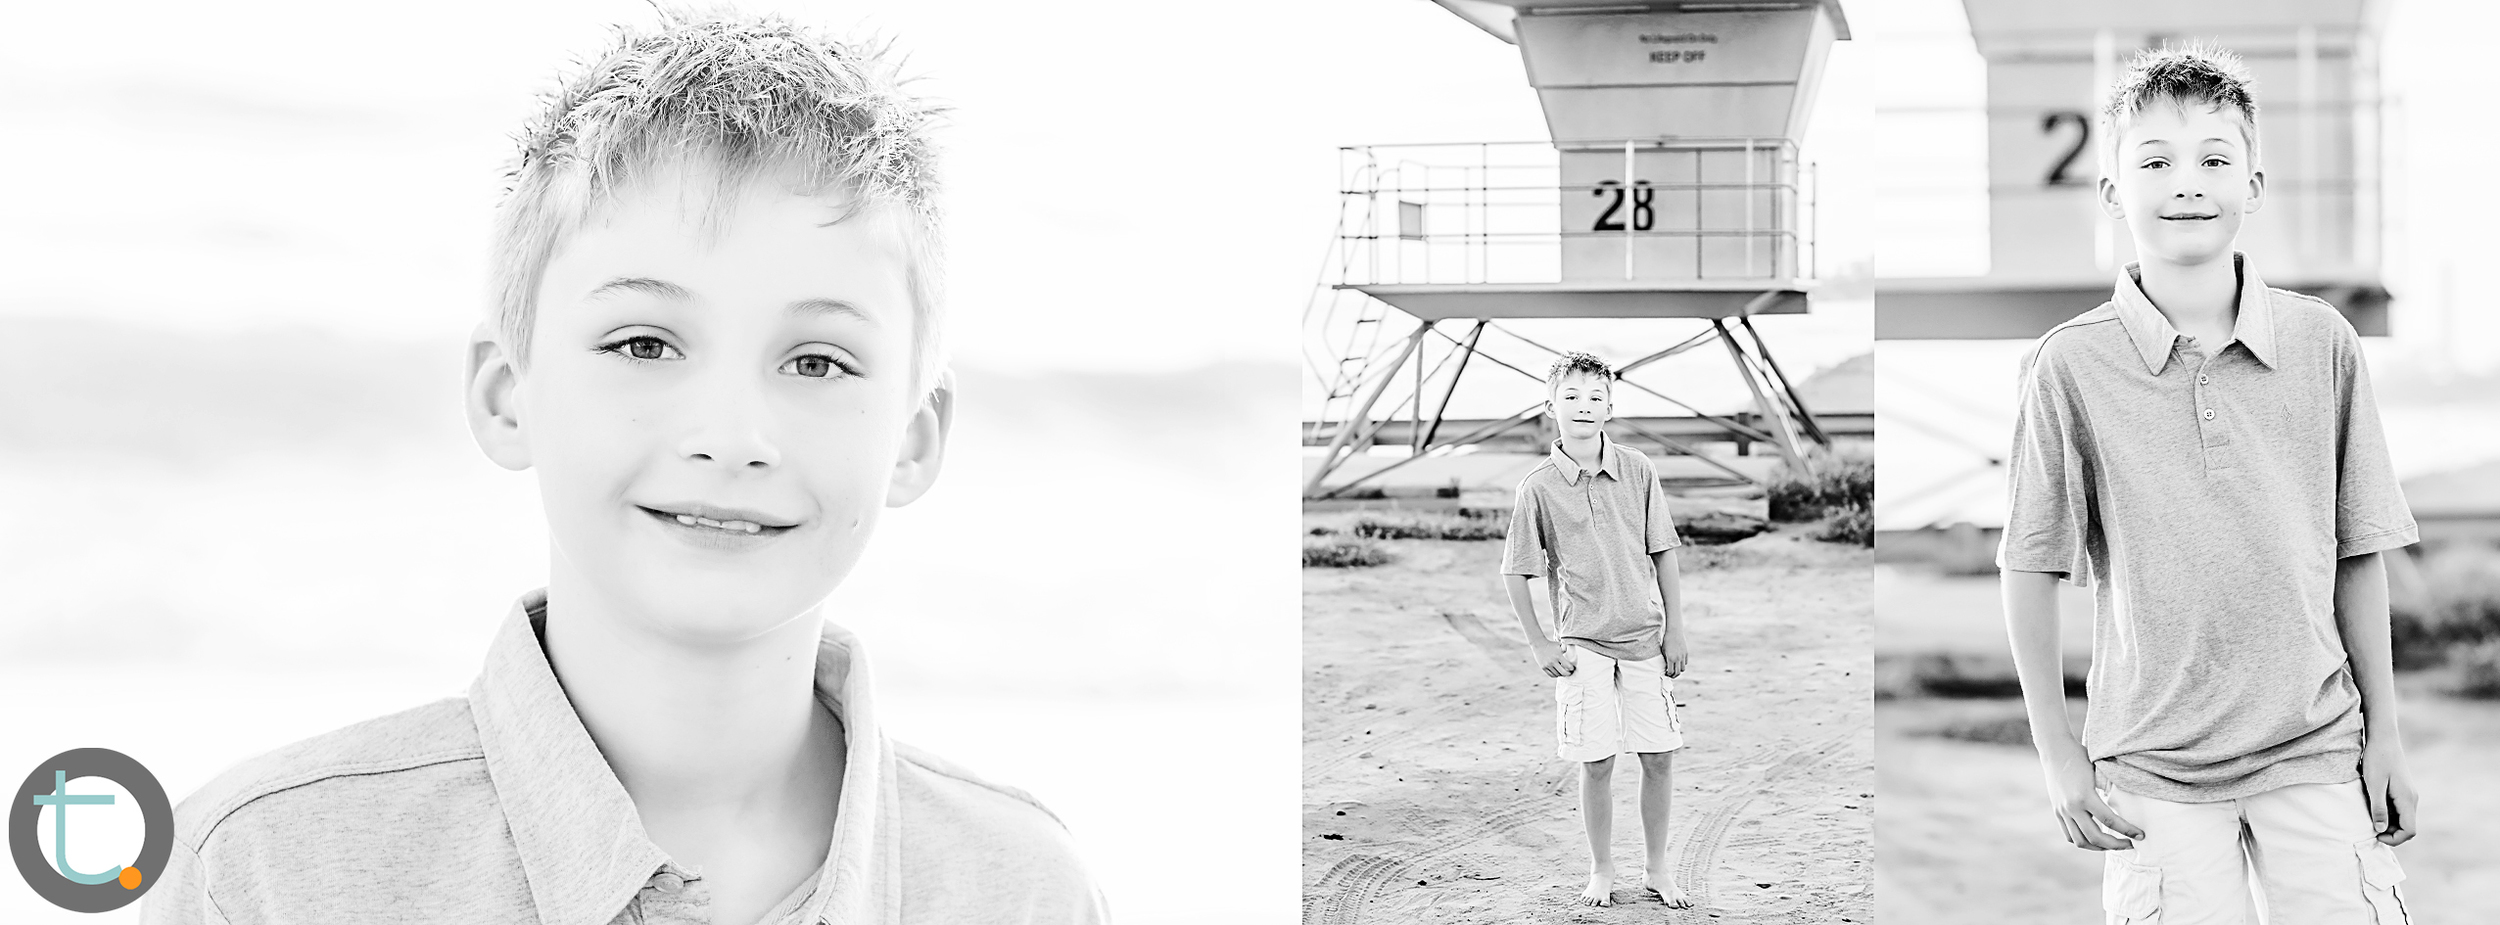 beach_boy_california_sandiego_son_campbell_tracyallynphotography